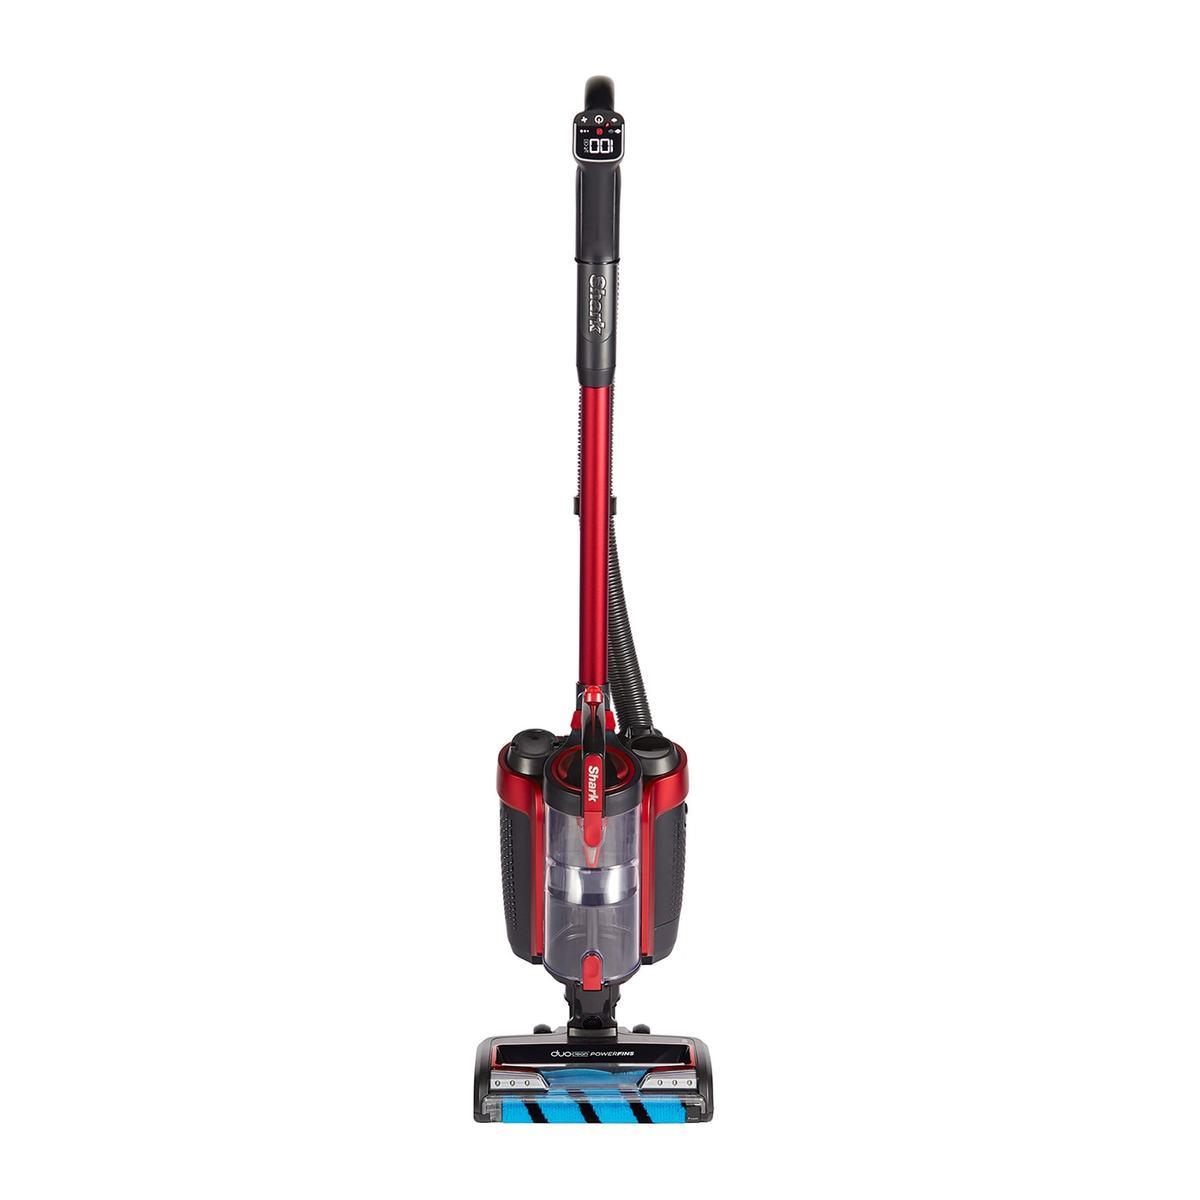 Shark ICZ160UK Anti Hair Wrap Cordless Upright Vacuum Cleaner